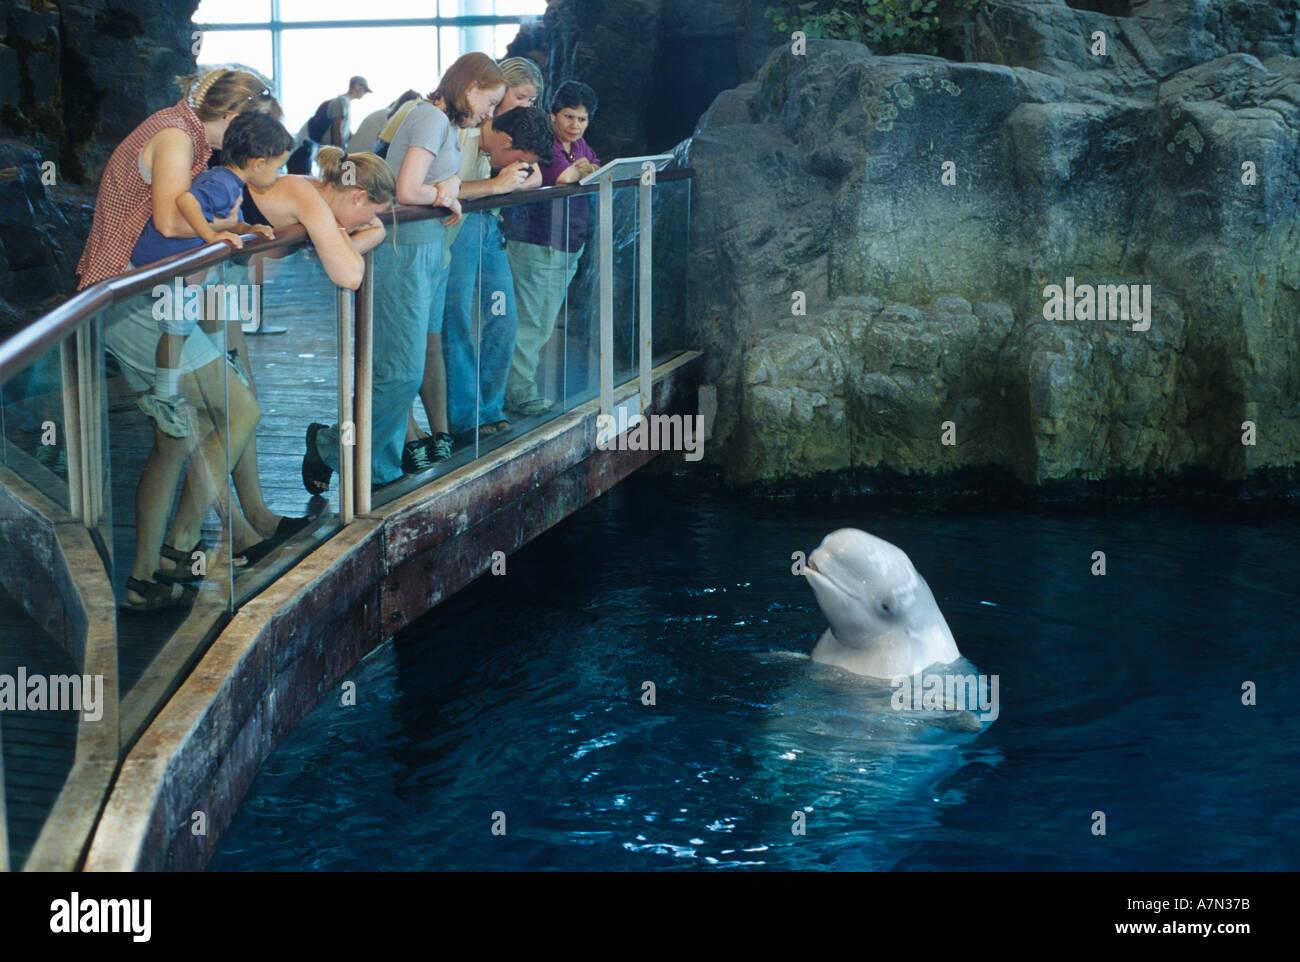 Visitors View A Beluga Whale At The Shedd Aquarium In